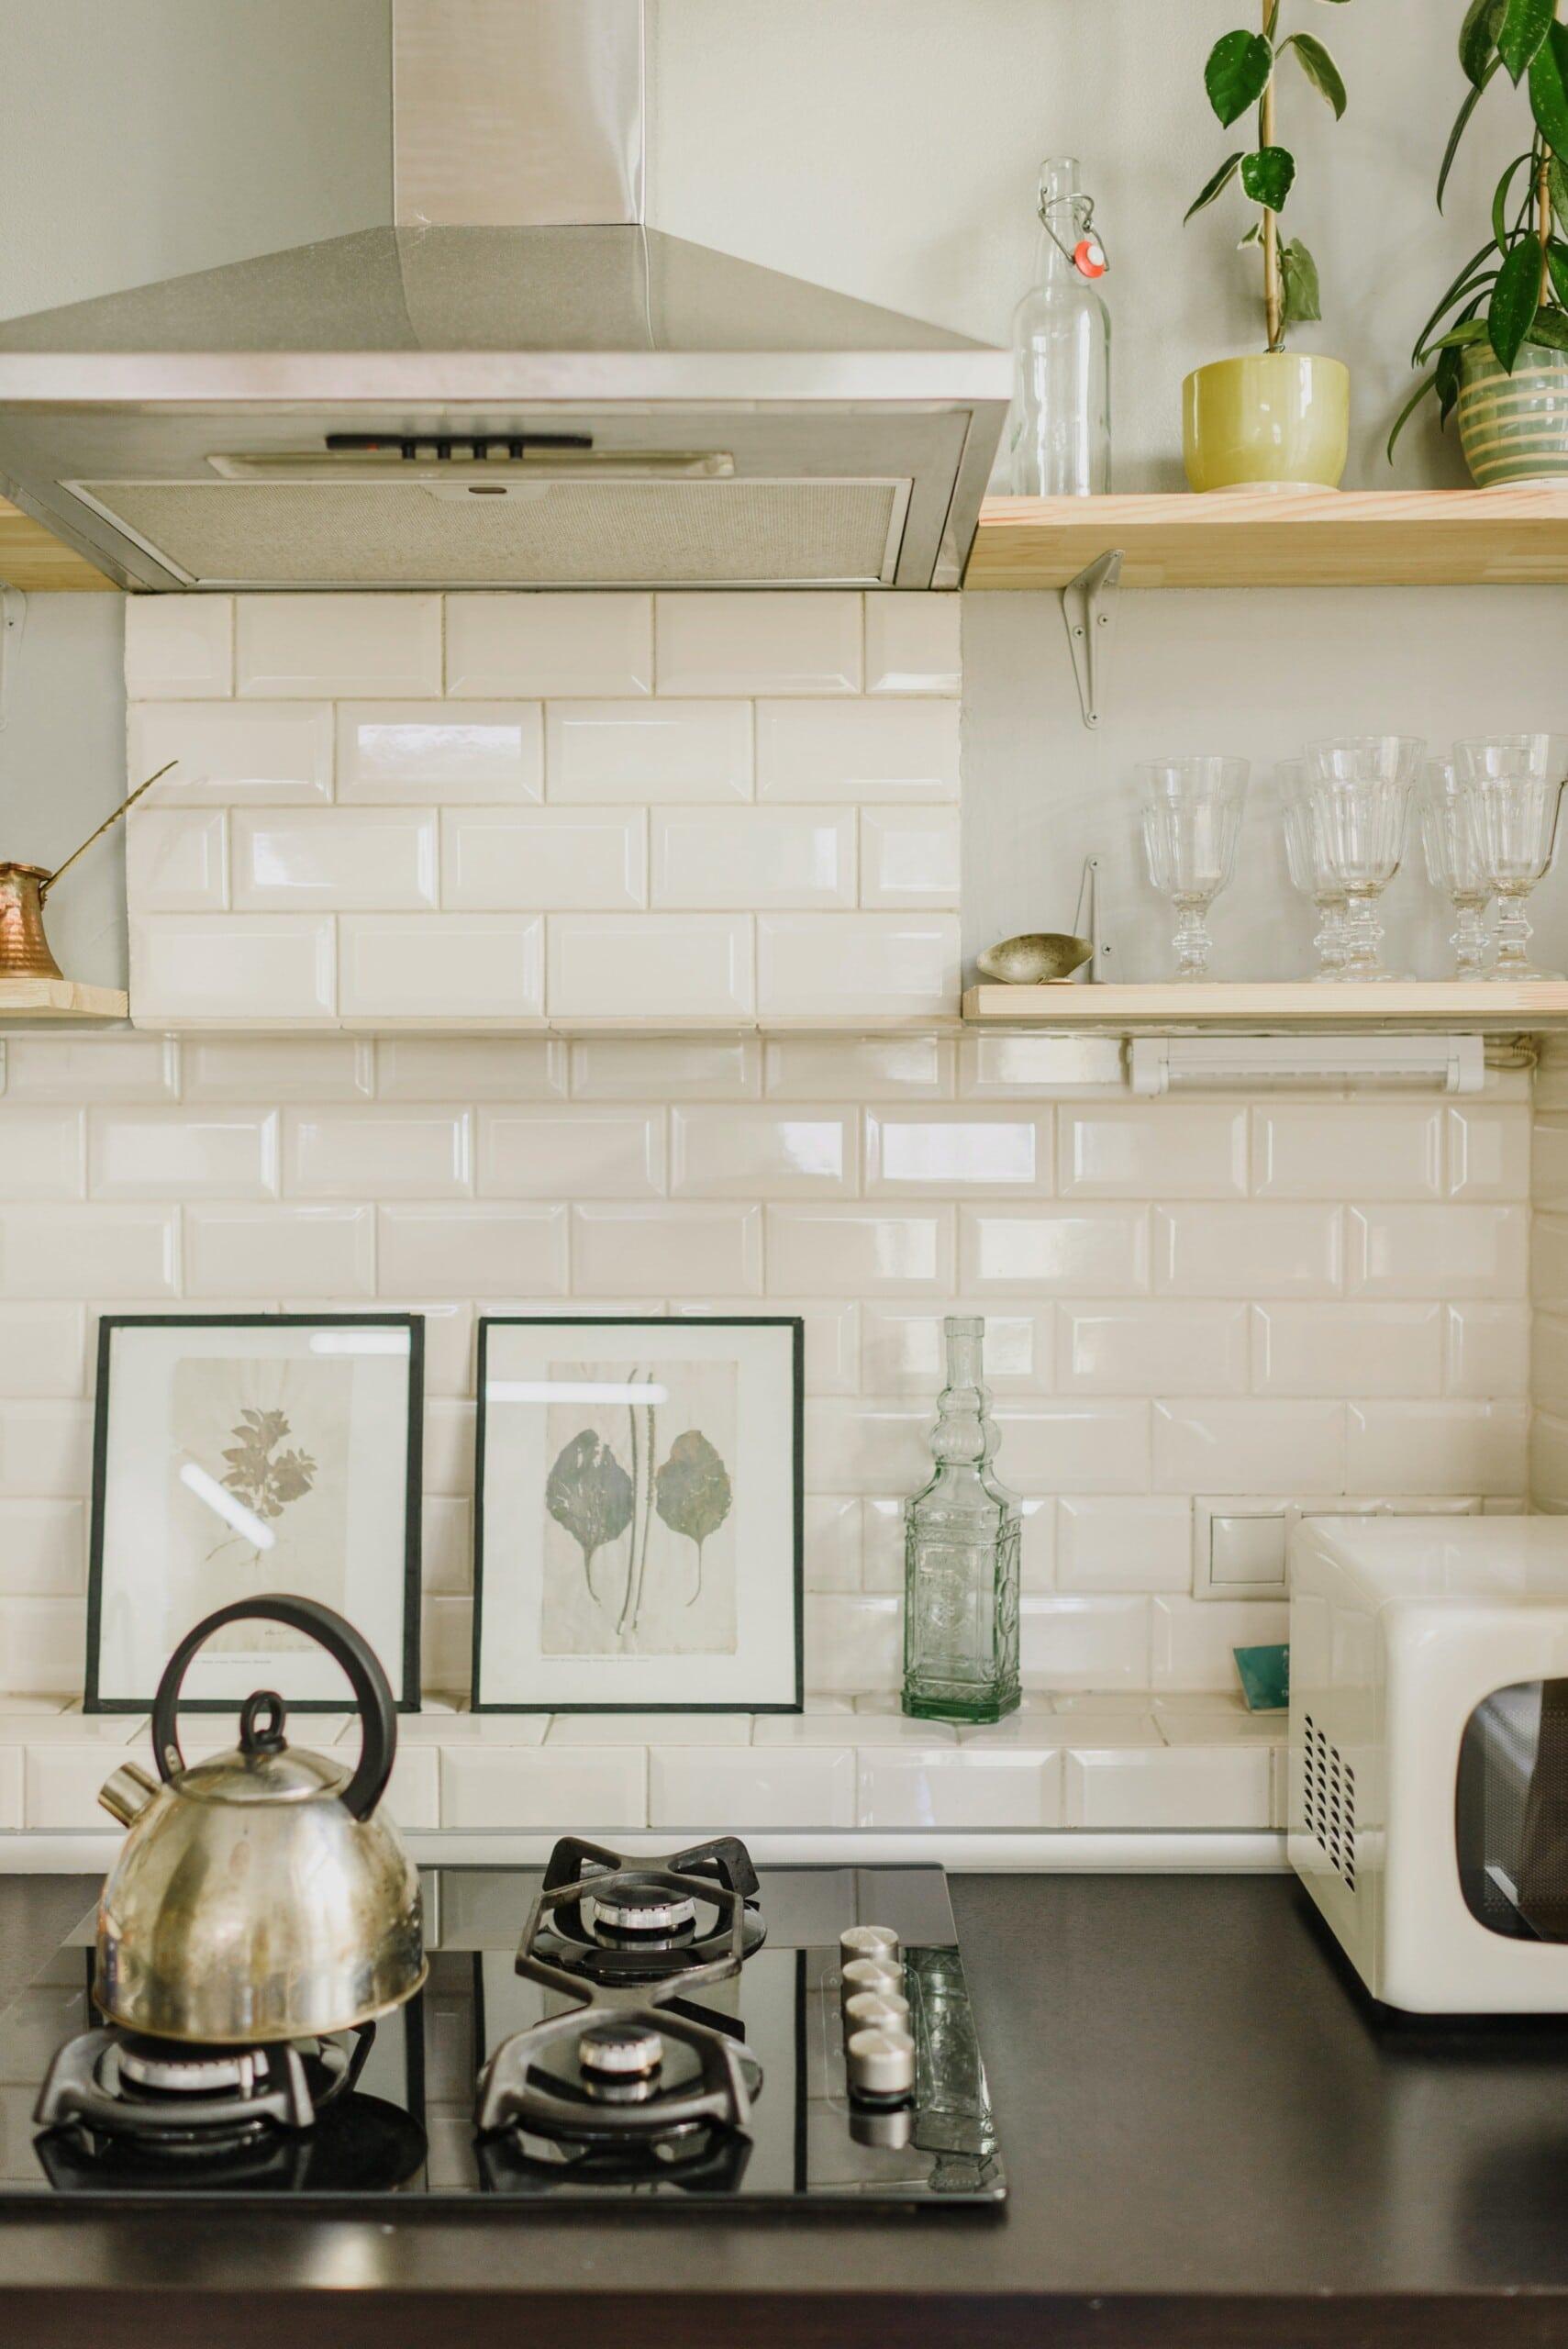 Splurge worthy Kitchen Tools and Apliances - Gas Range Stovetop